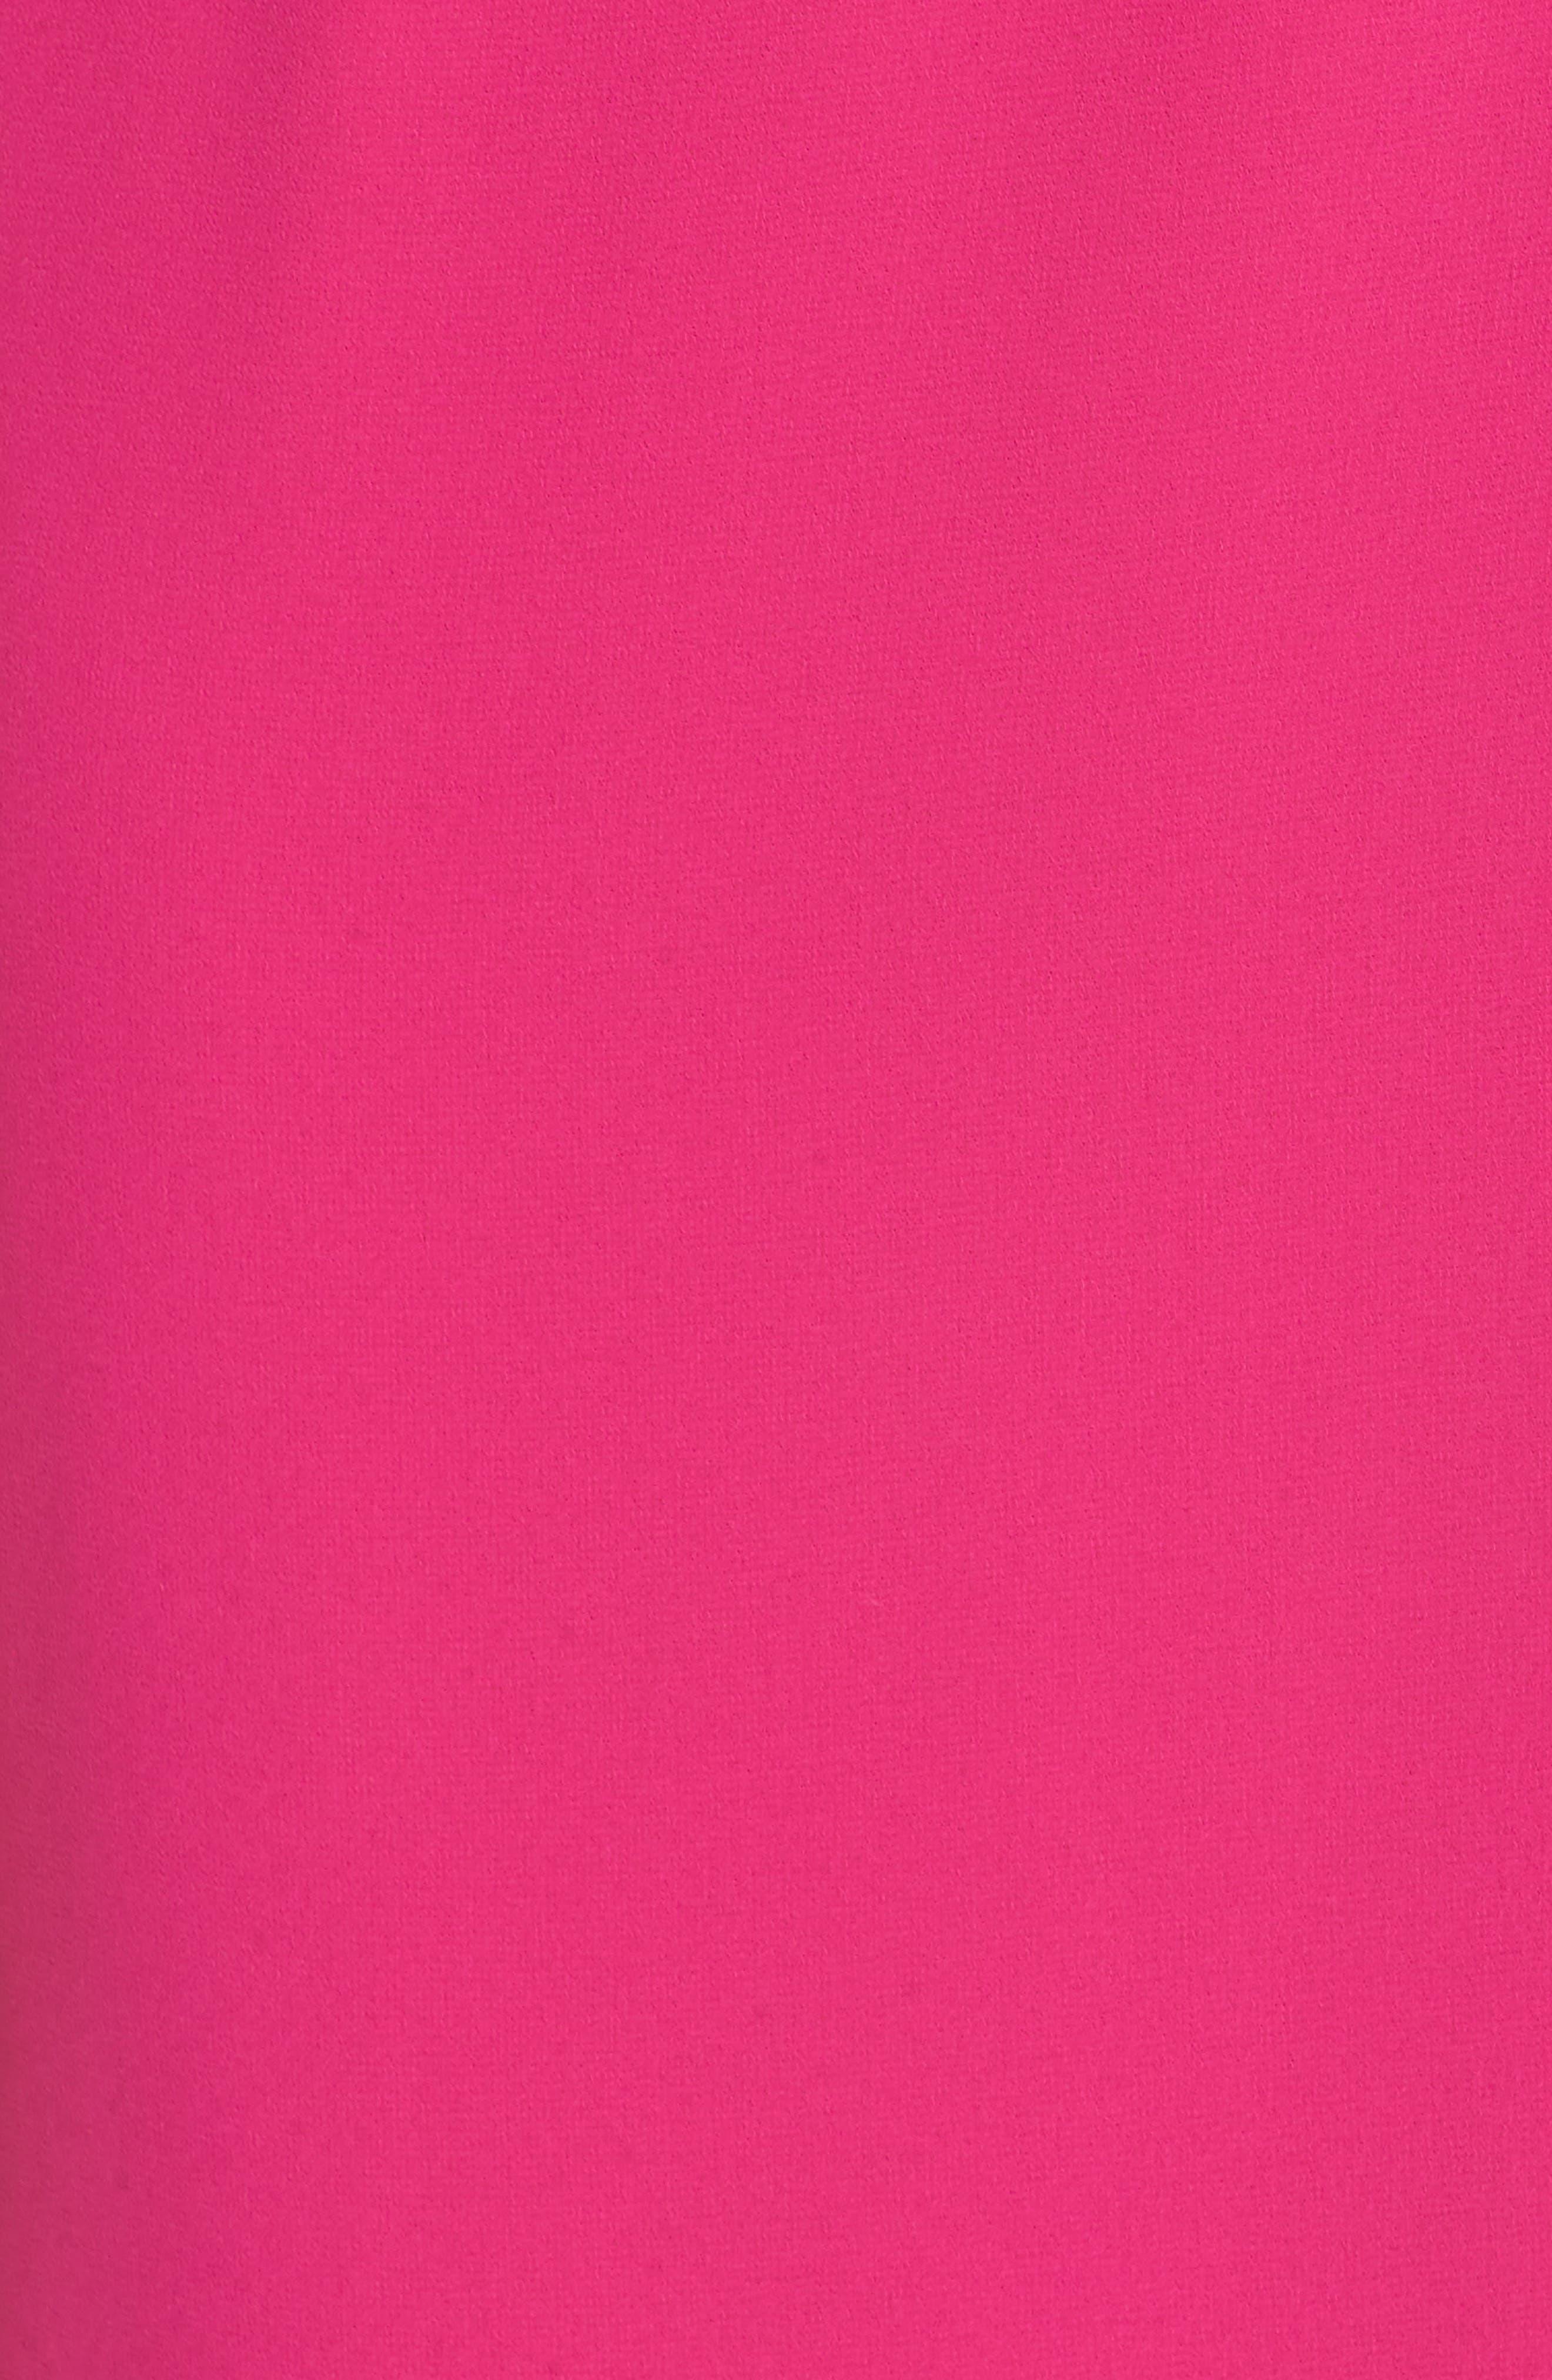 Asymmetrical Ruffle Column Gown,                             Alternate thumbnail 6, color,                             Fuchsia